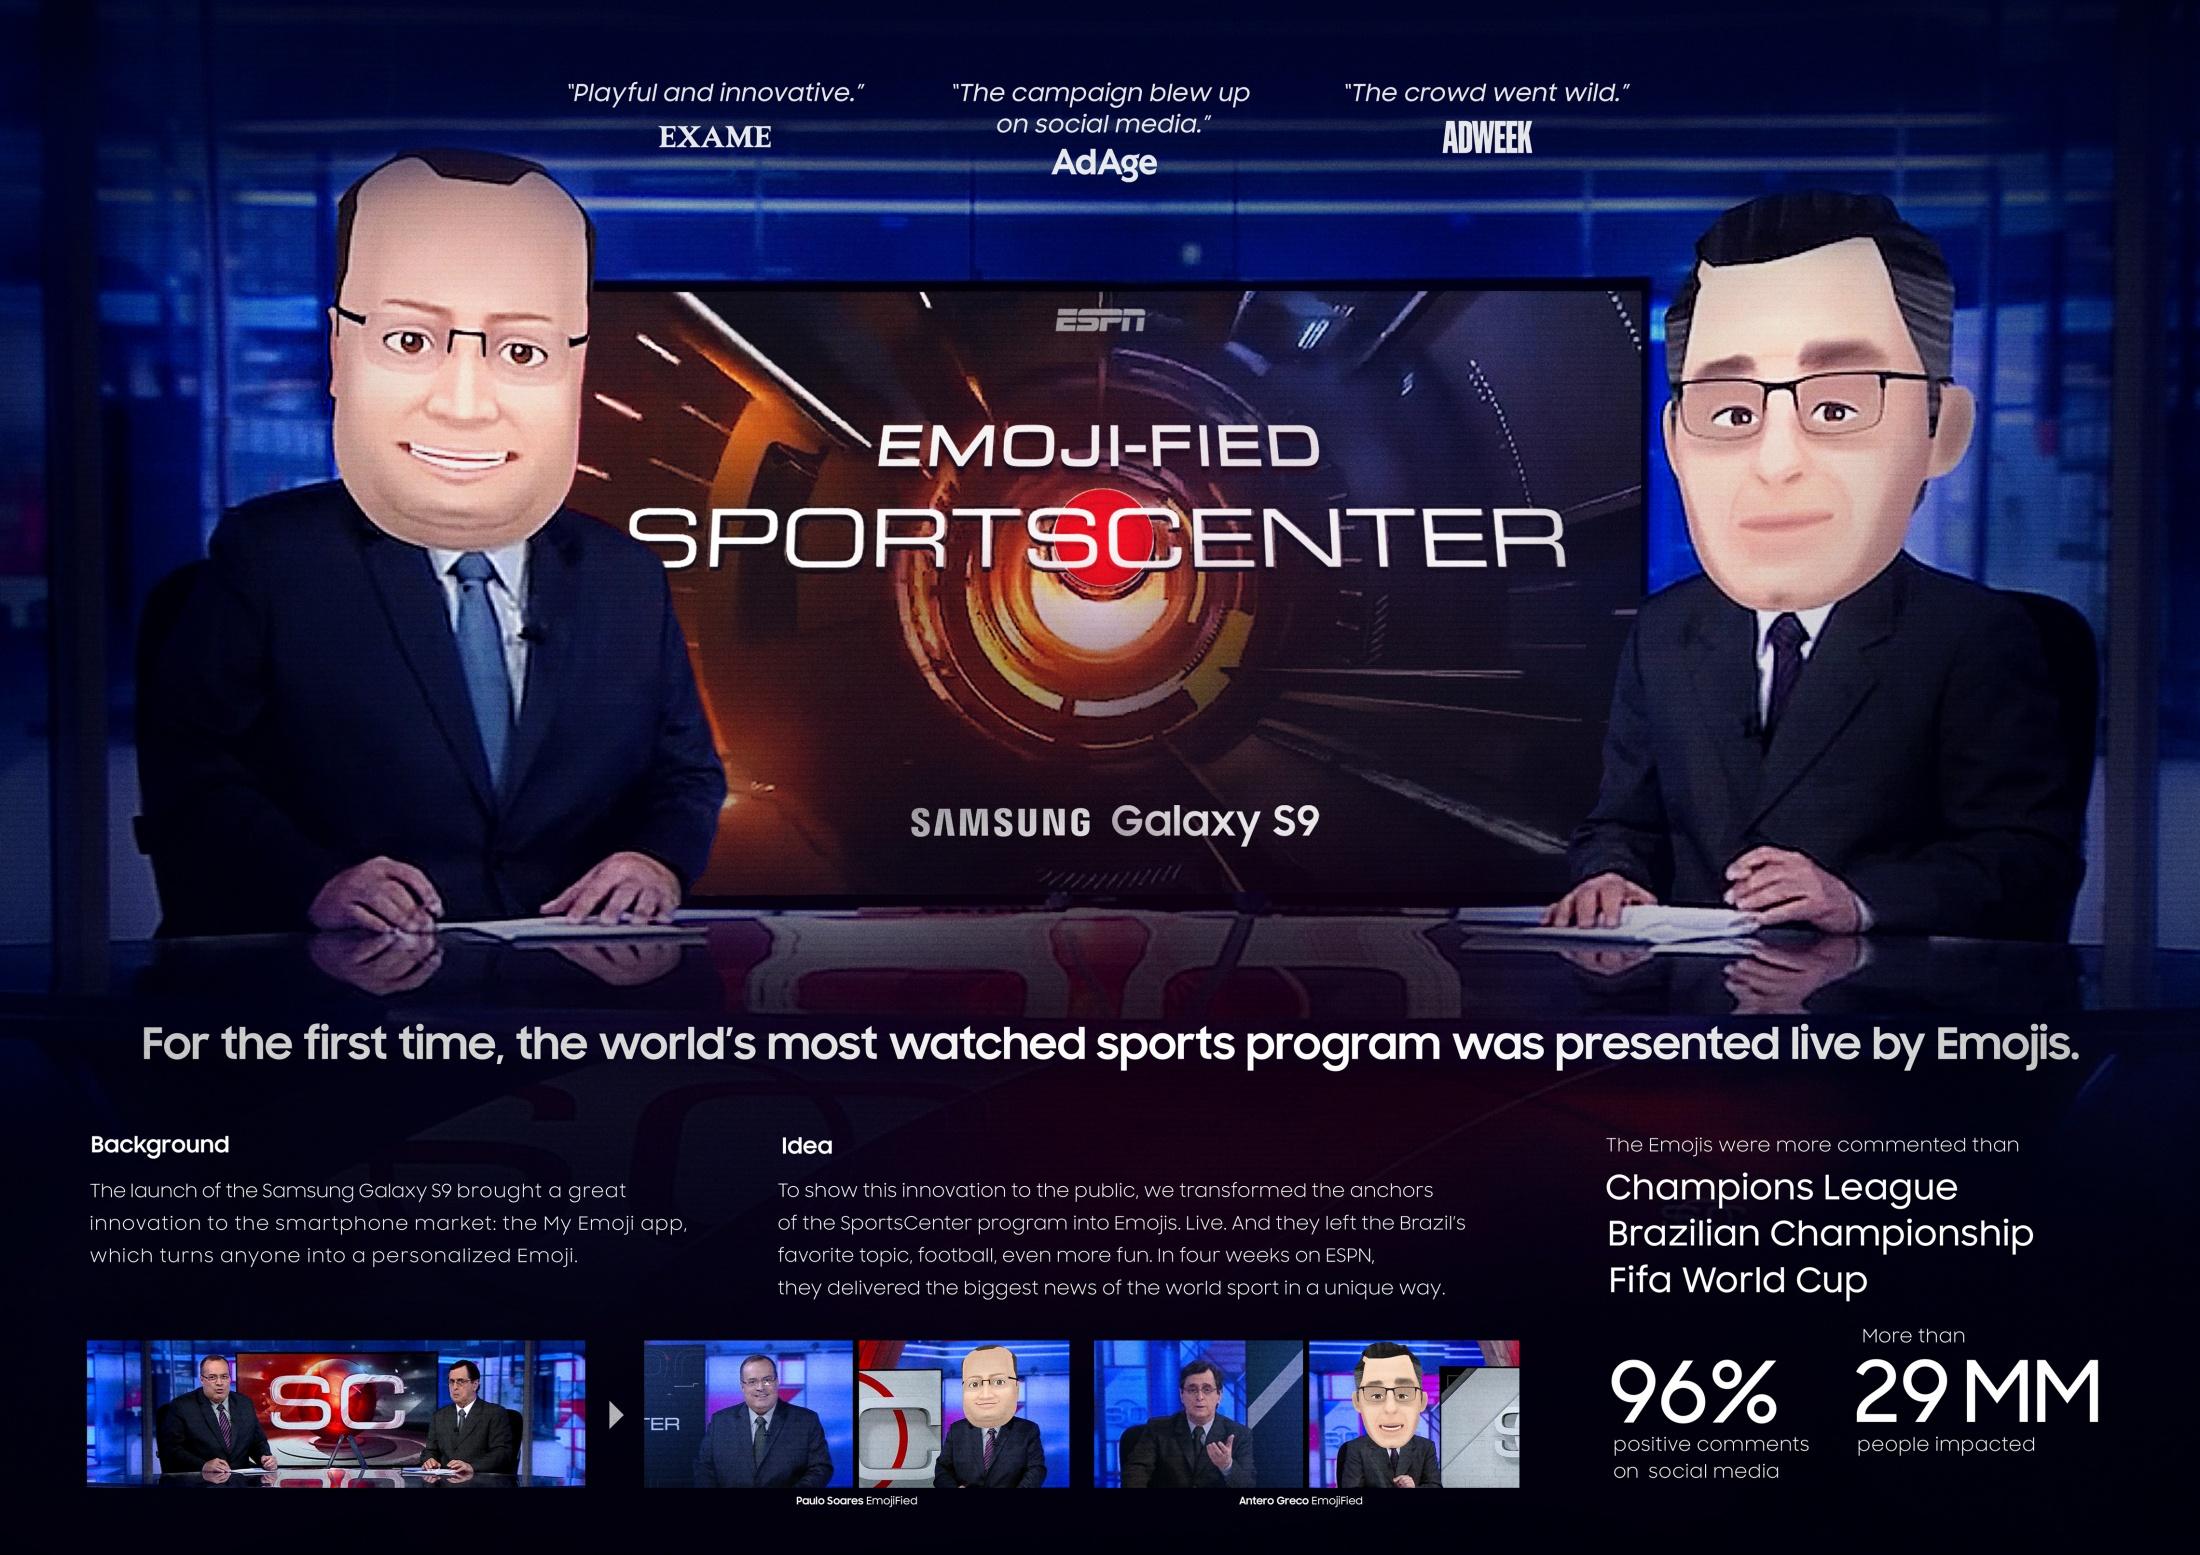 Thumbnail for SportsCenter Emoji-fied